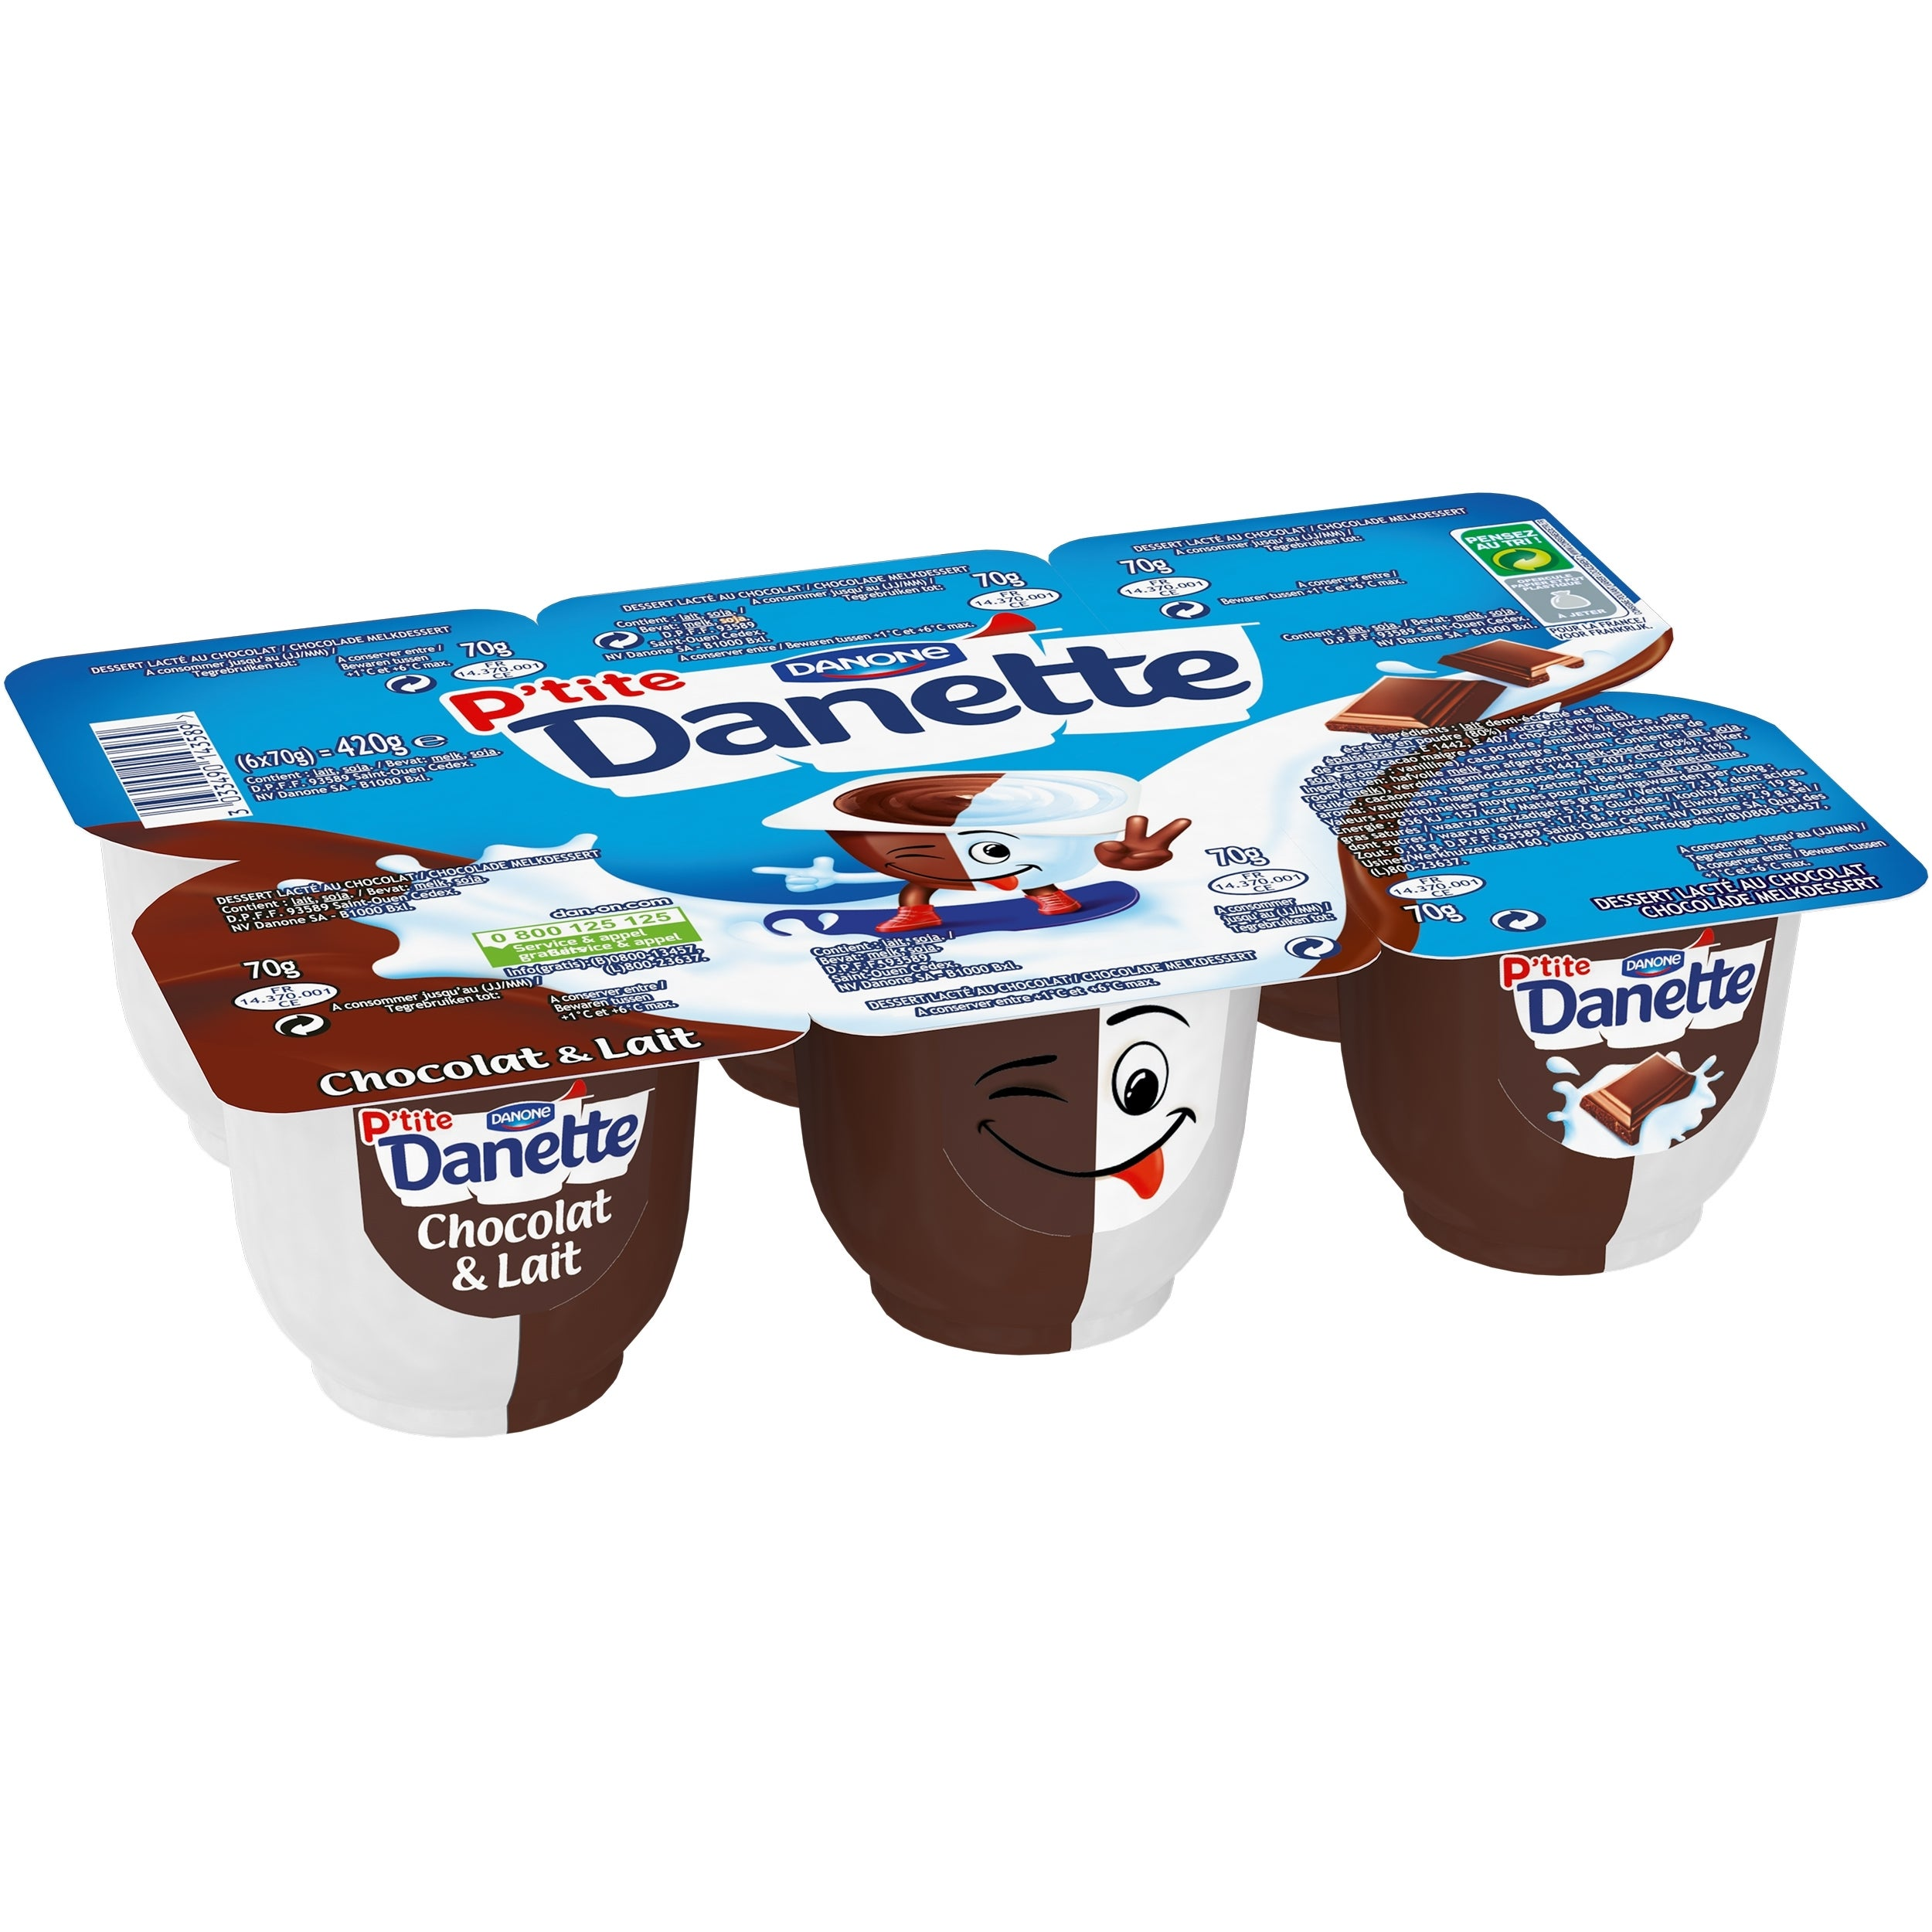 P'tite Danette Chocolade & Melk